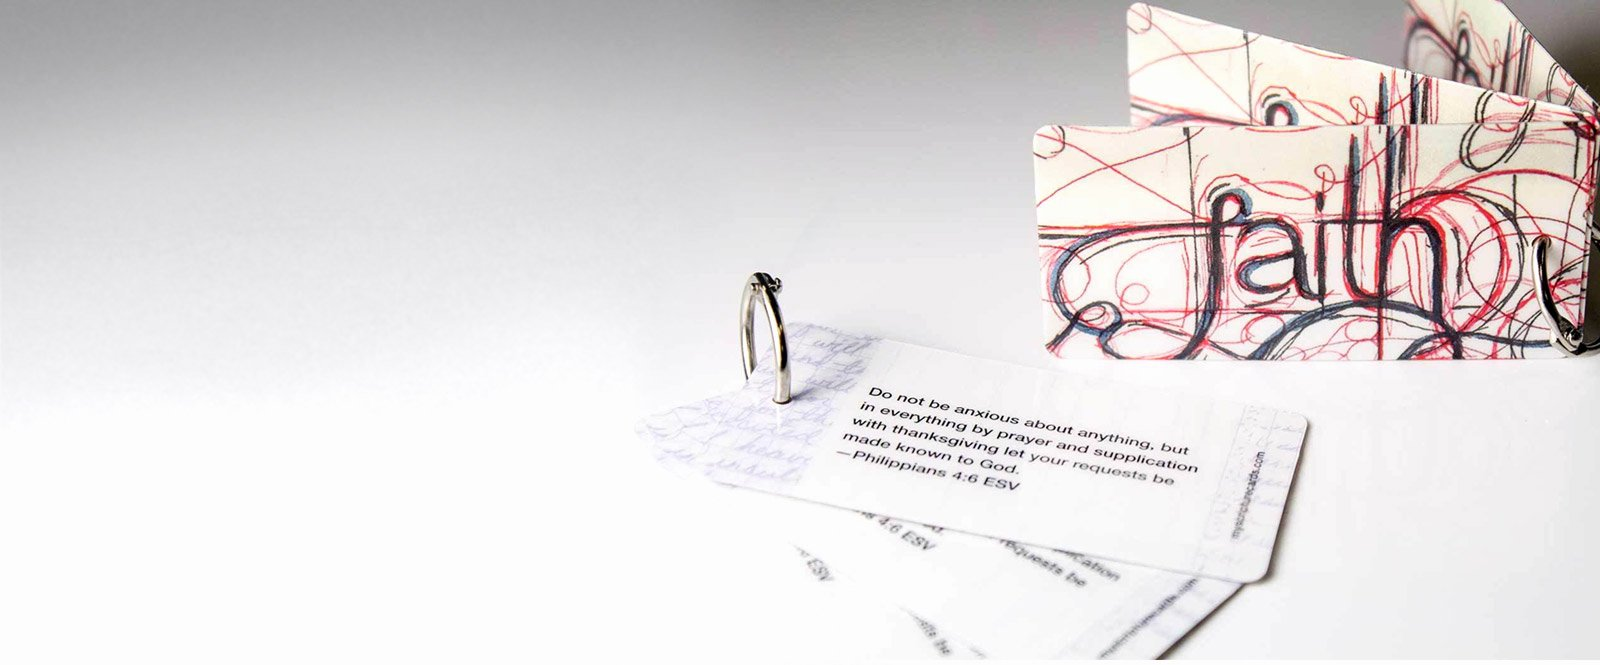 Free Missionary Prayer Card Template Inspirational Custom Prayer Cards & Holy Cards